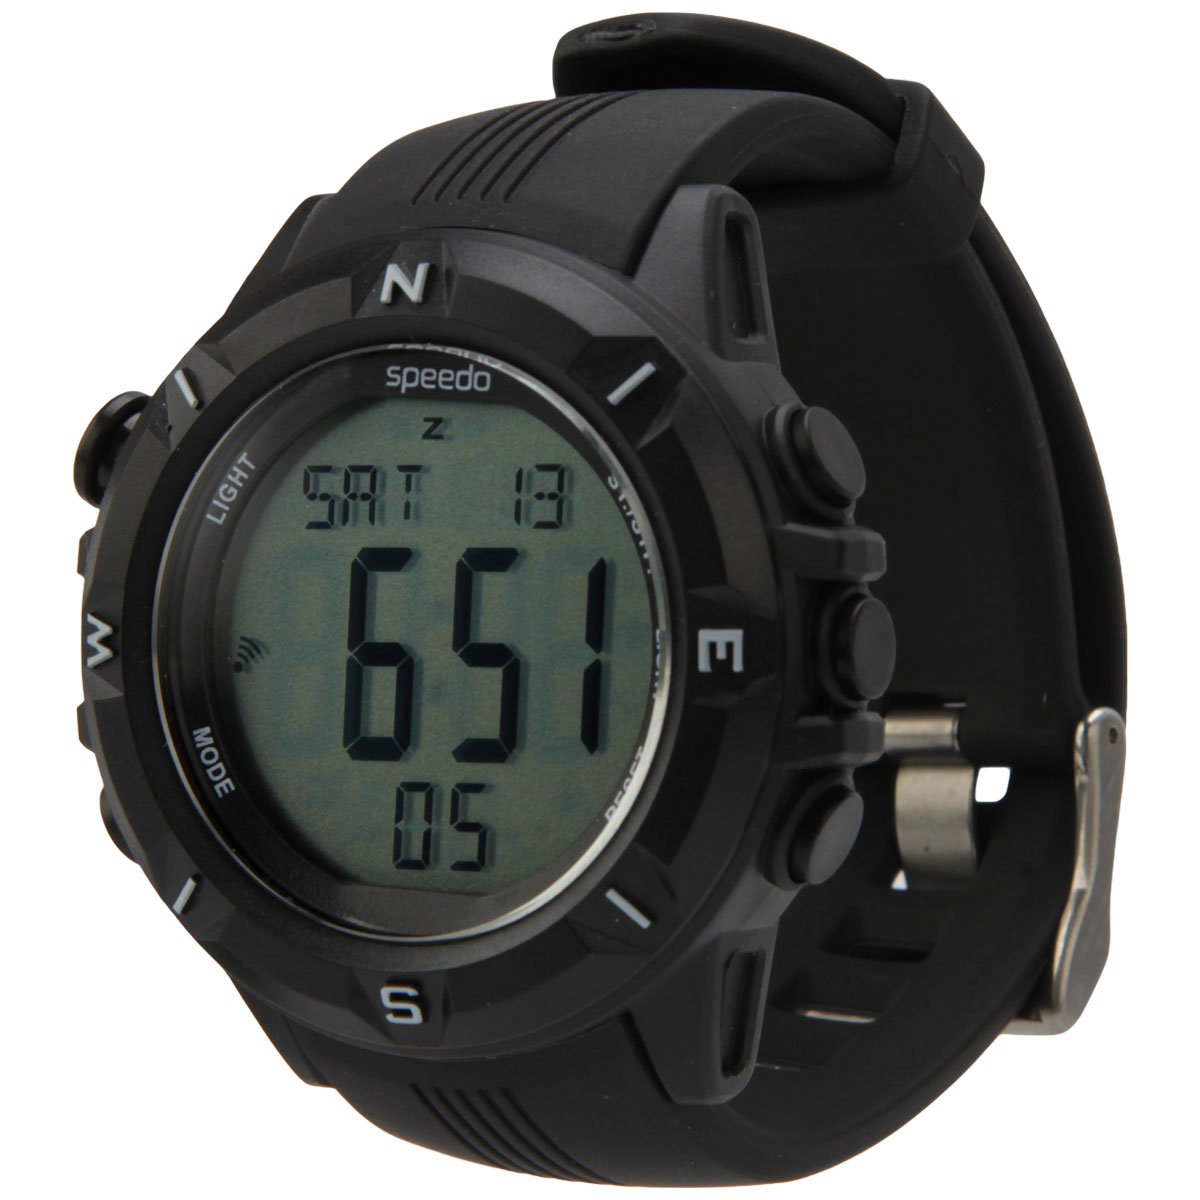 5a47d01aff7 Monitor Cardíaco Speedo Stamina 58009G0EVNP1 - Compre Agora